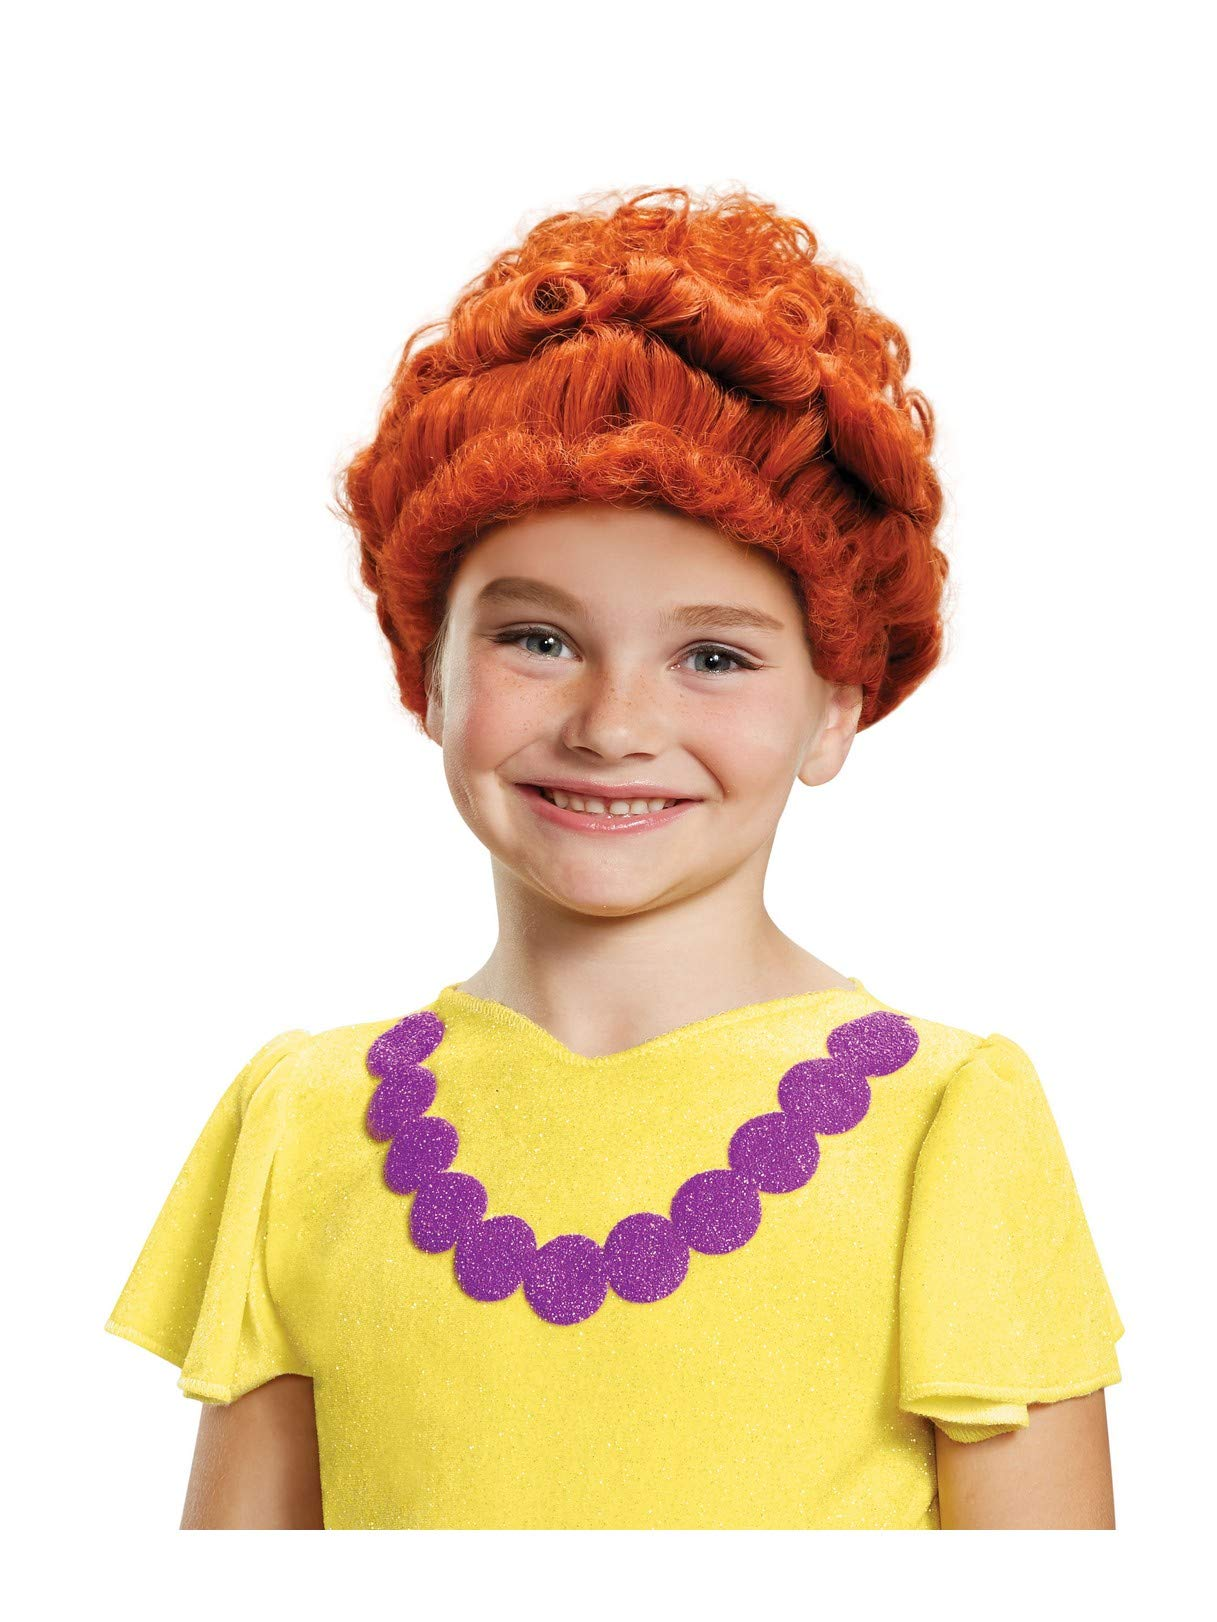 Fancy Nancy Wig Costume Accessory Red